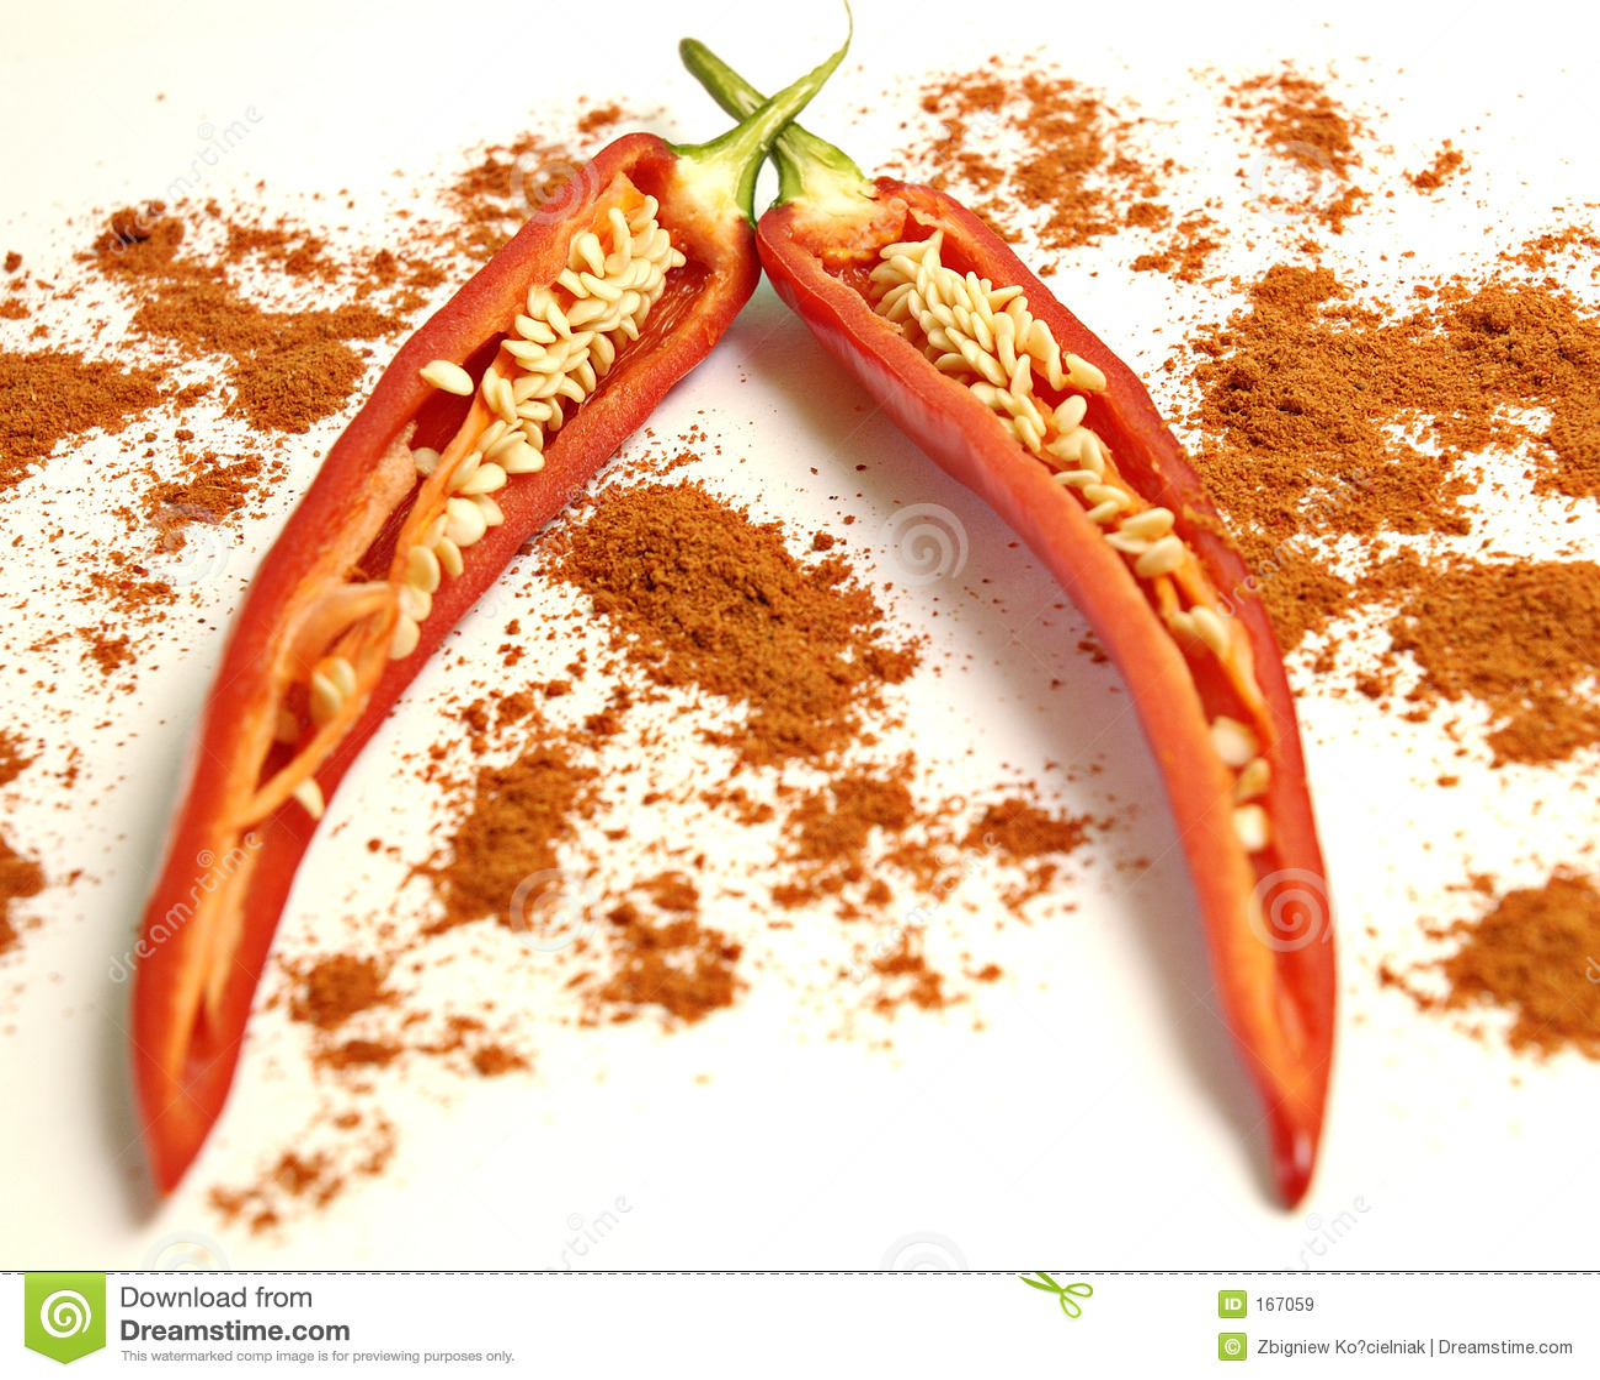 Paprikas spice